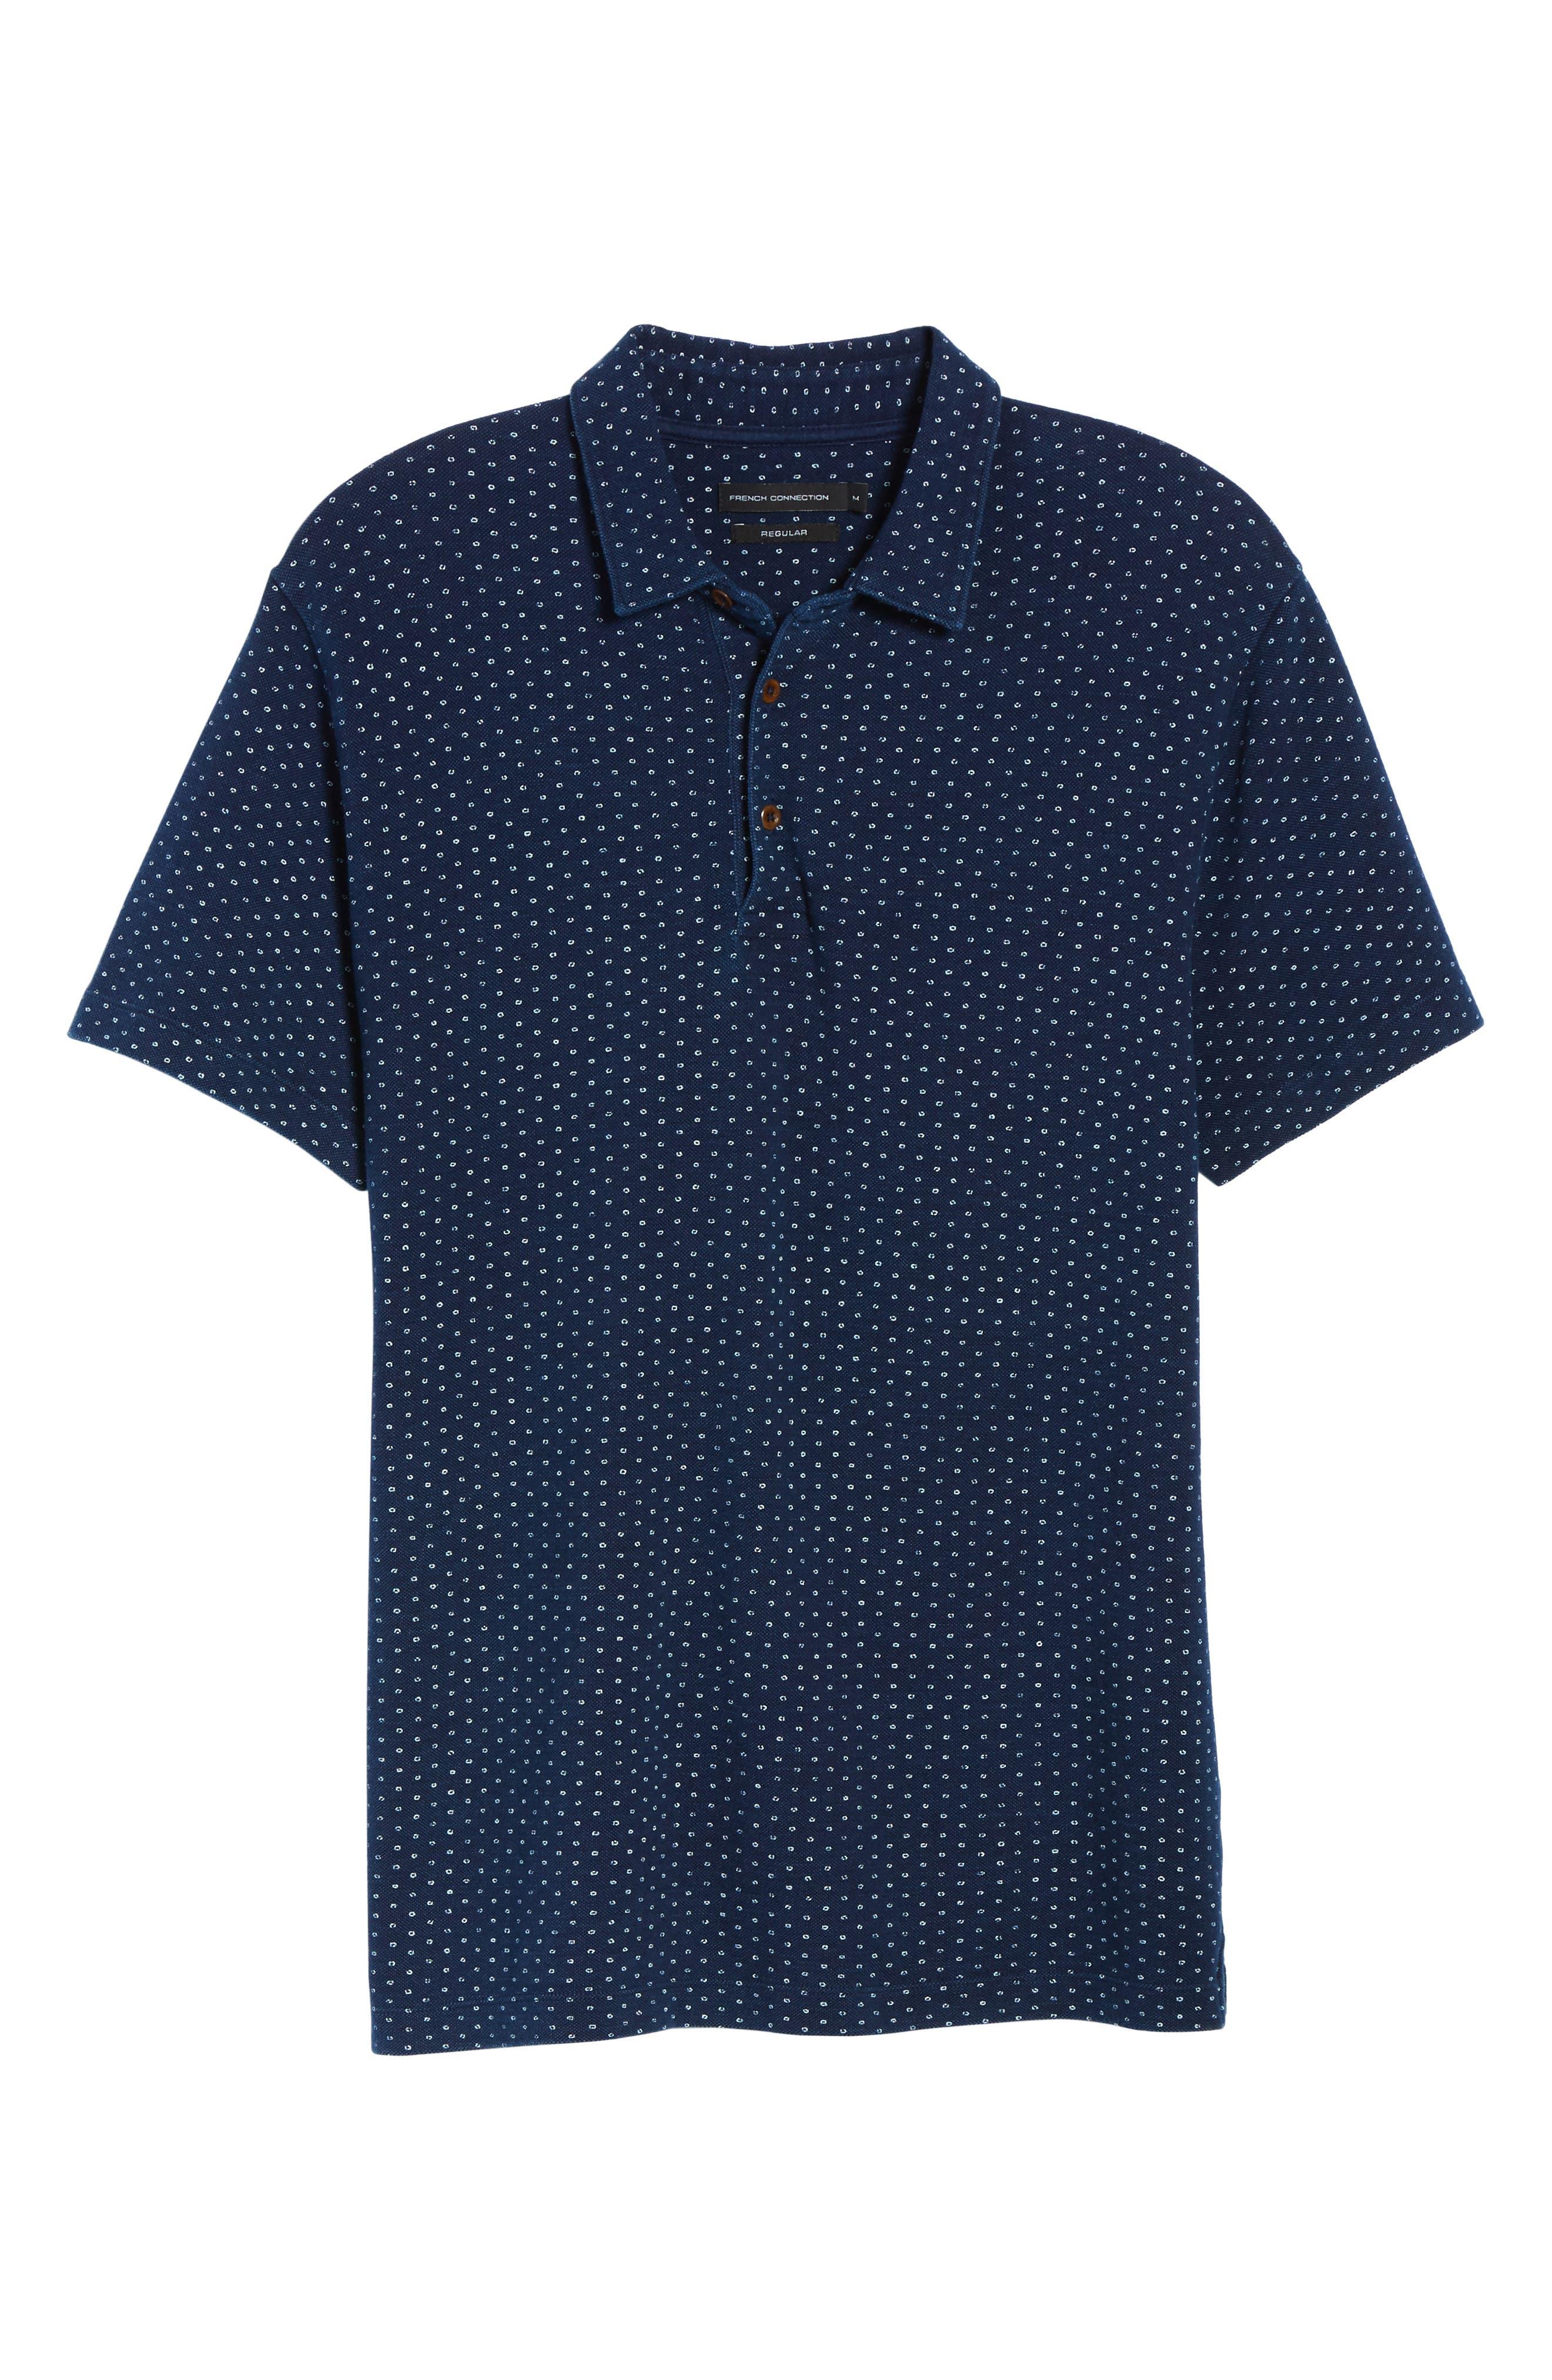 Alternate Image 5  - French Connection Dojo Dot Regular Fit Cotton Polo